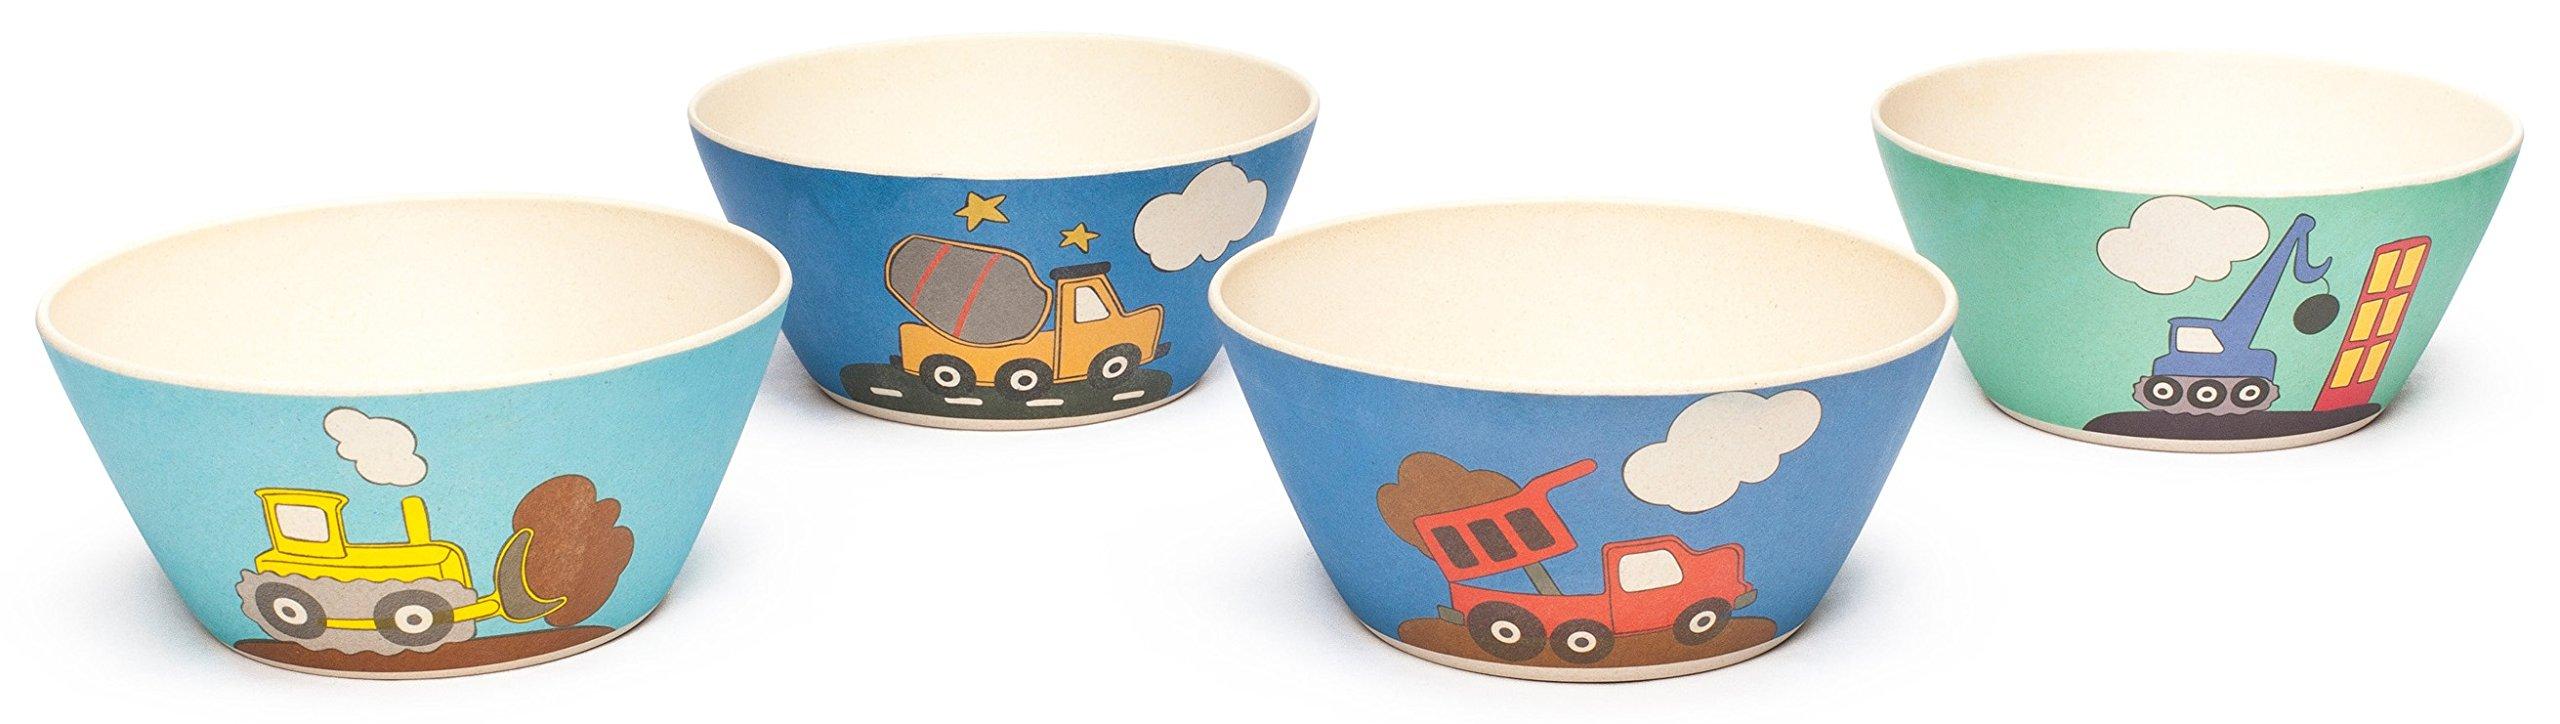 Bamboozle Tiny Footprints Construction Bowls Set of 4, 24 Piece